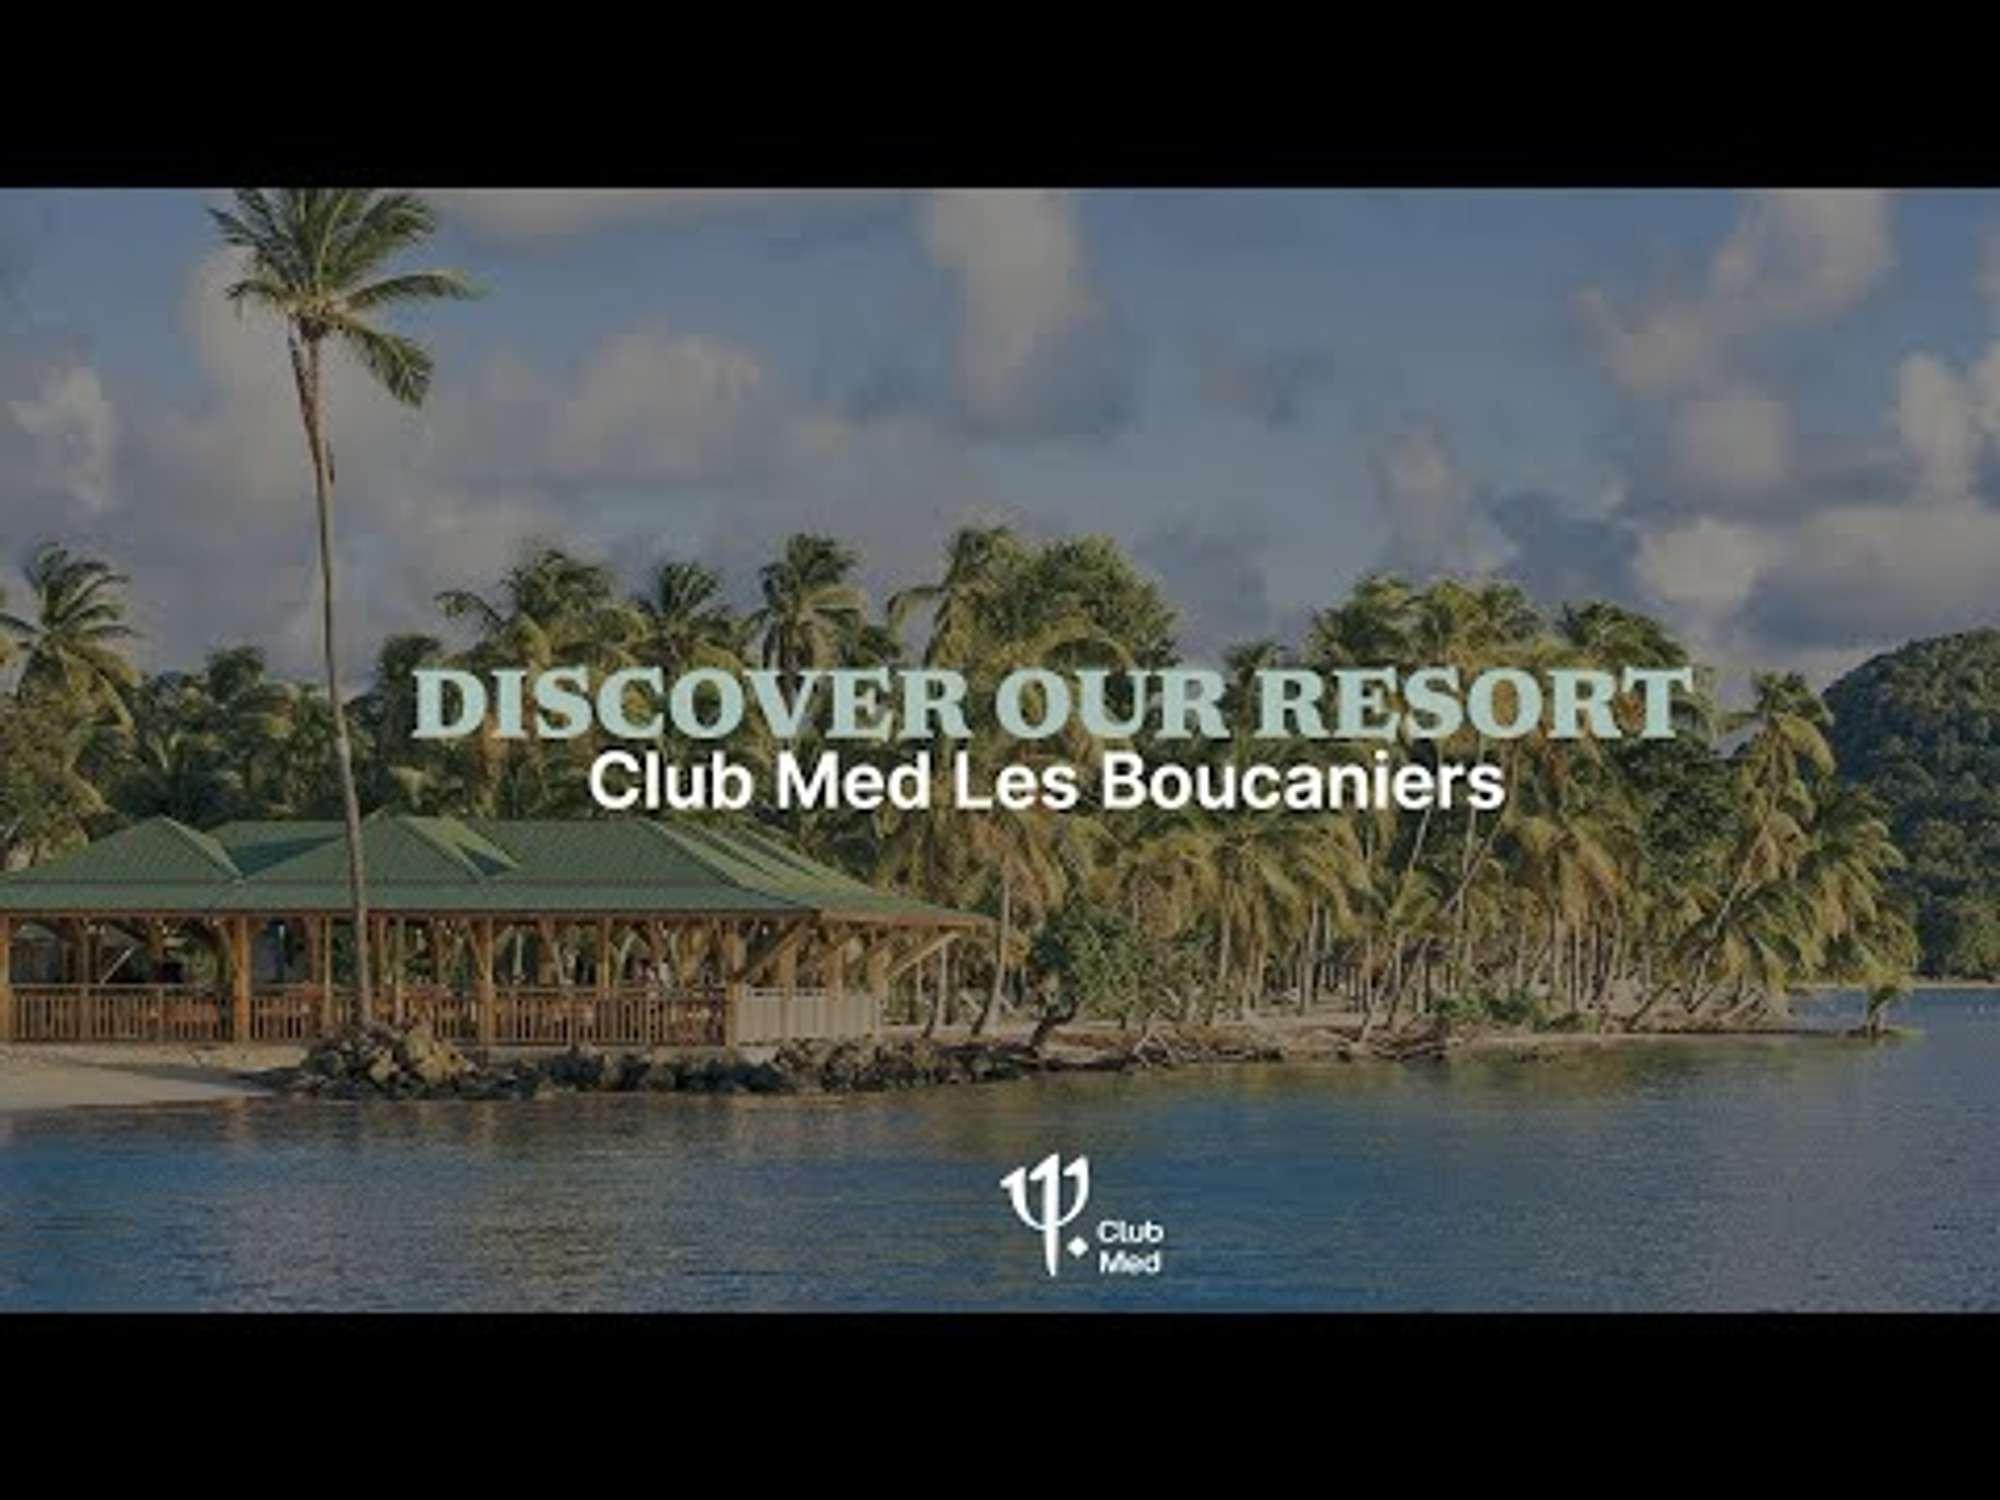 Open Les Boucaniers וידיאו slideshow gallery at 1